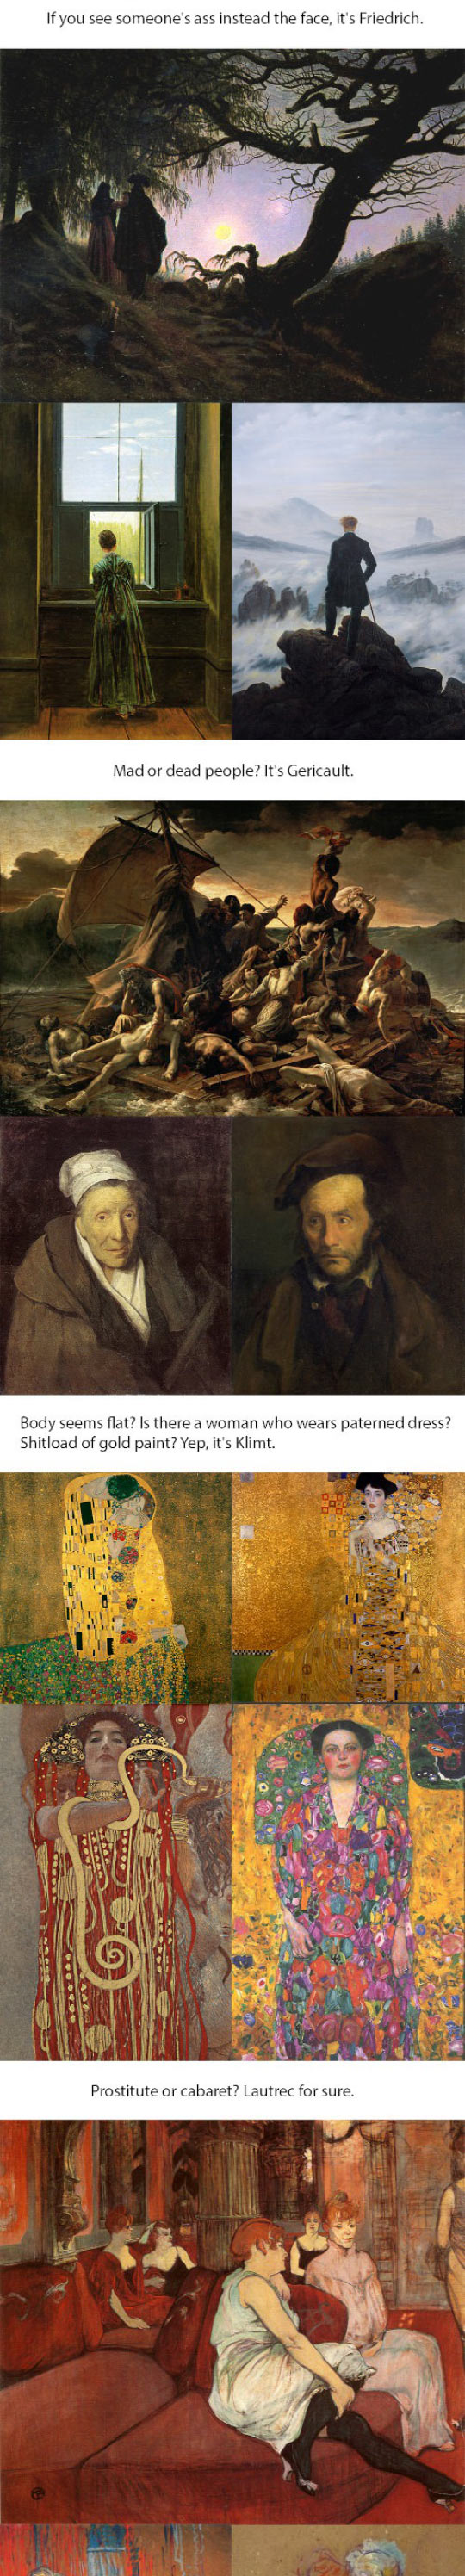 2funny-painters-famous-guide-recognize-them-gericault